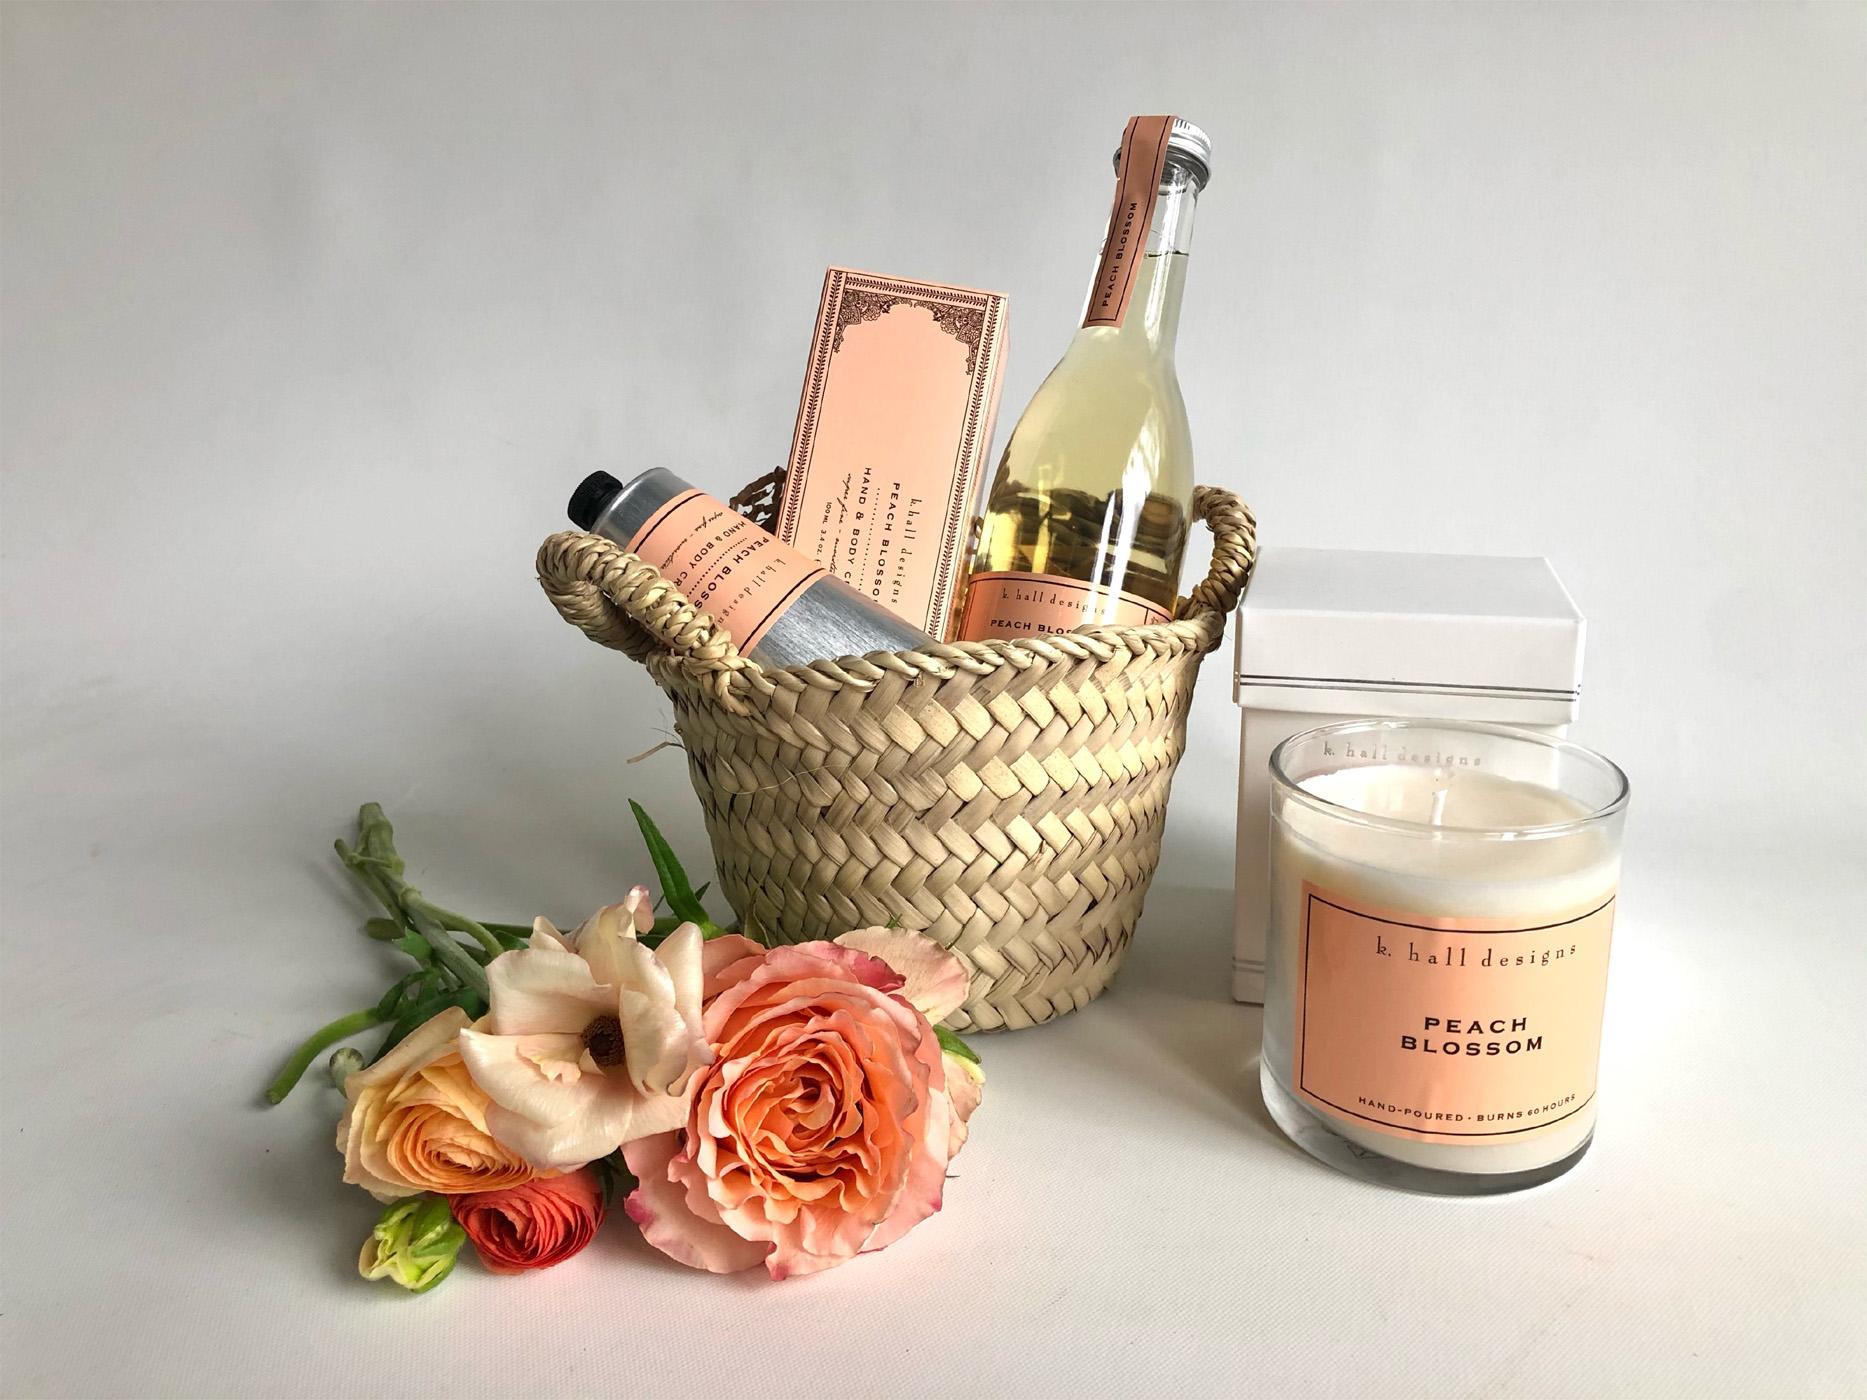 Peach Blossom Collection